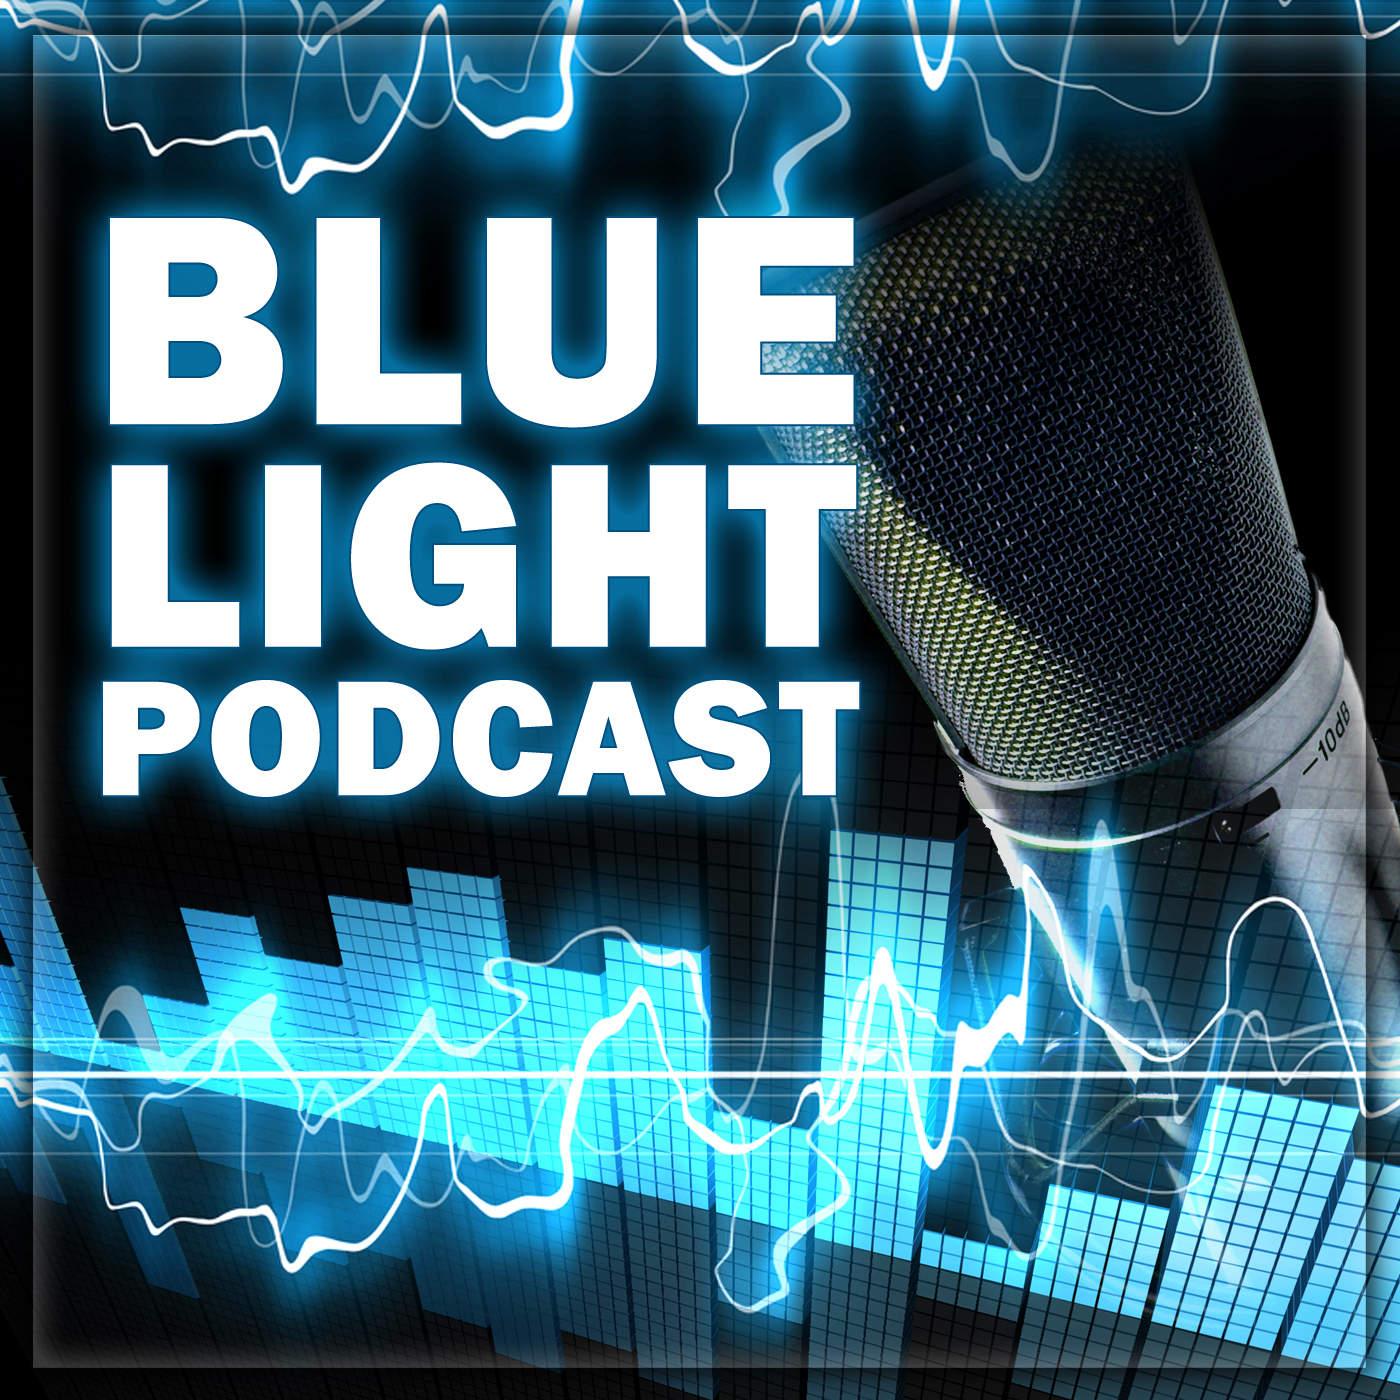 Blue Light Podcast